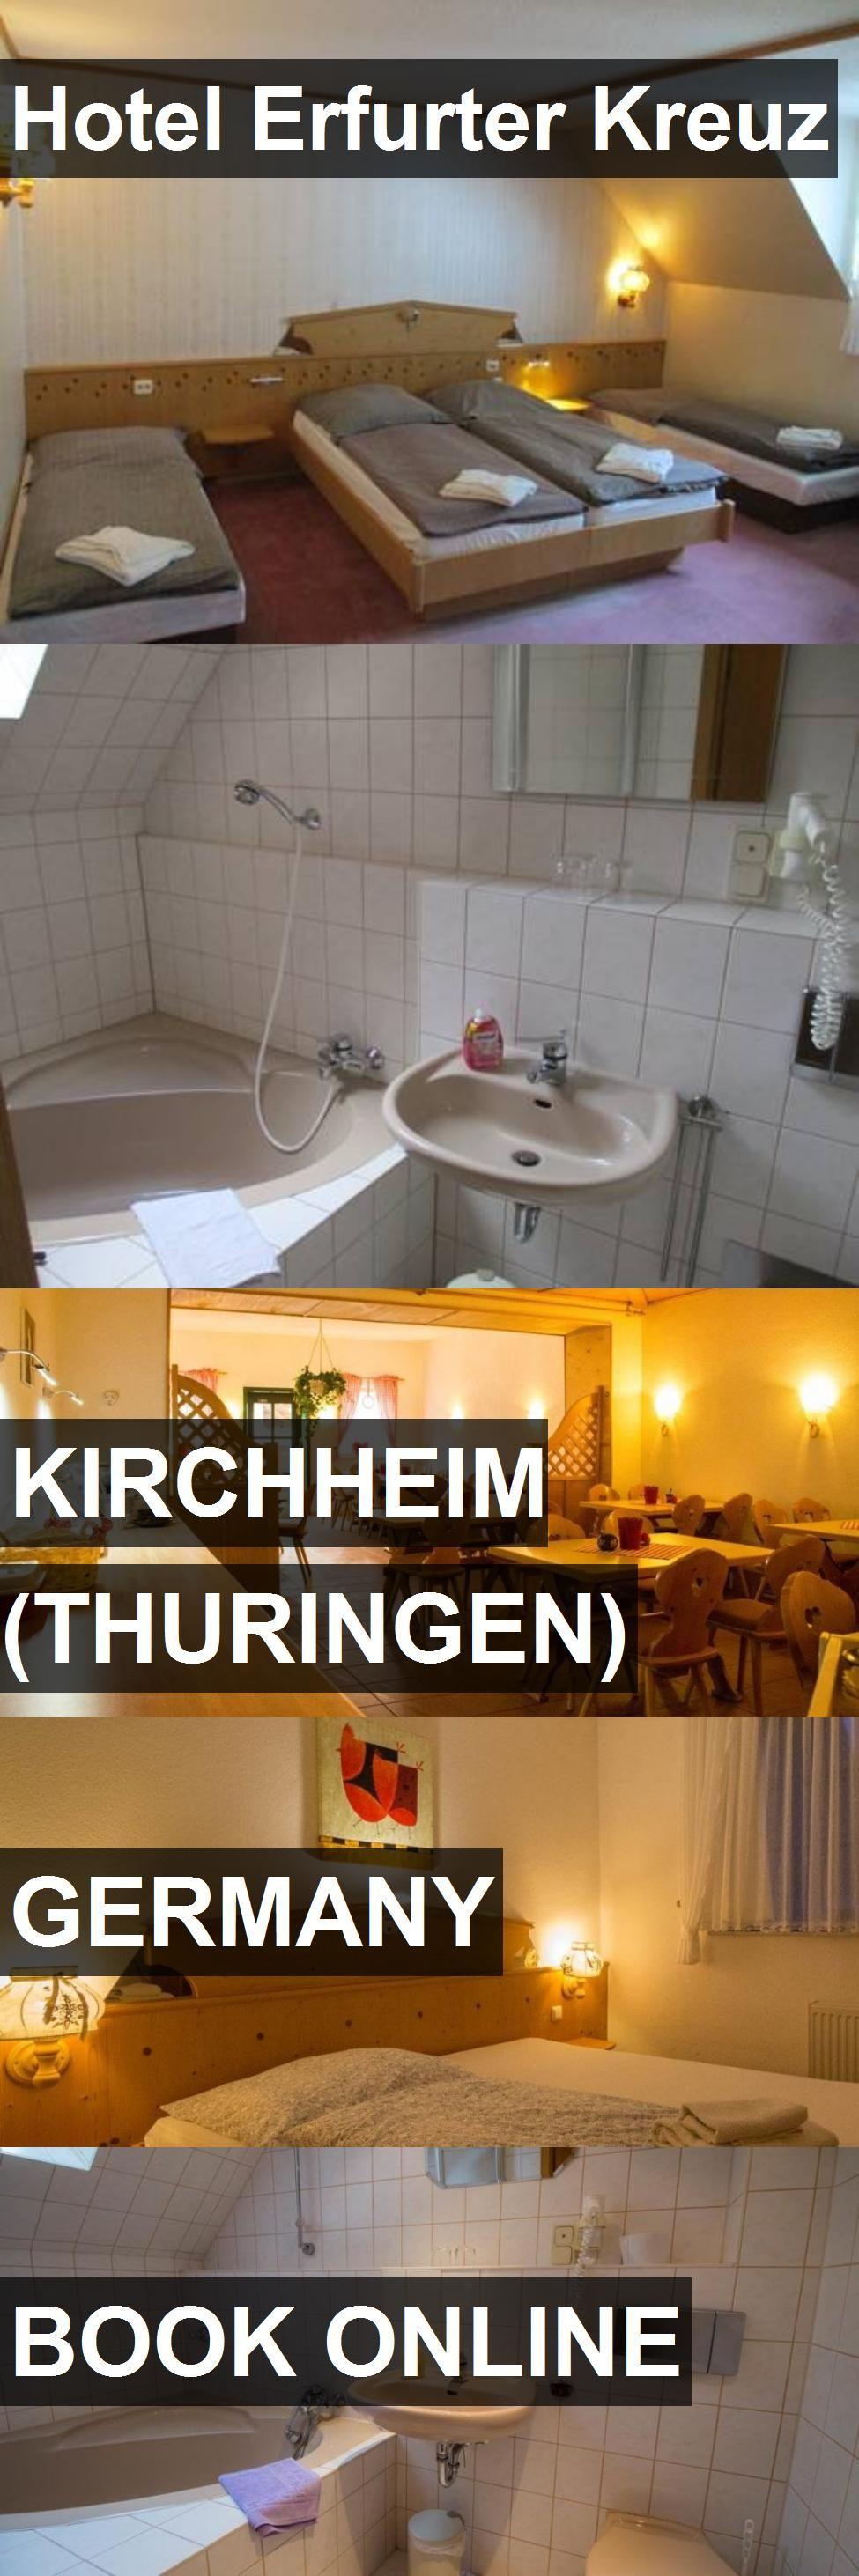 Casino Thuringen